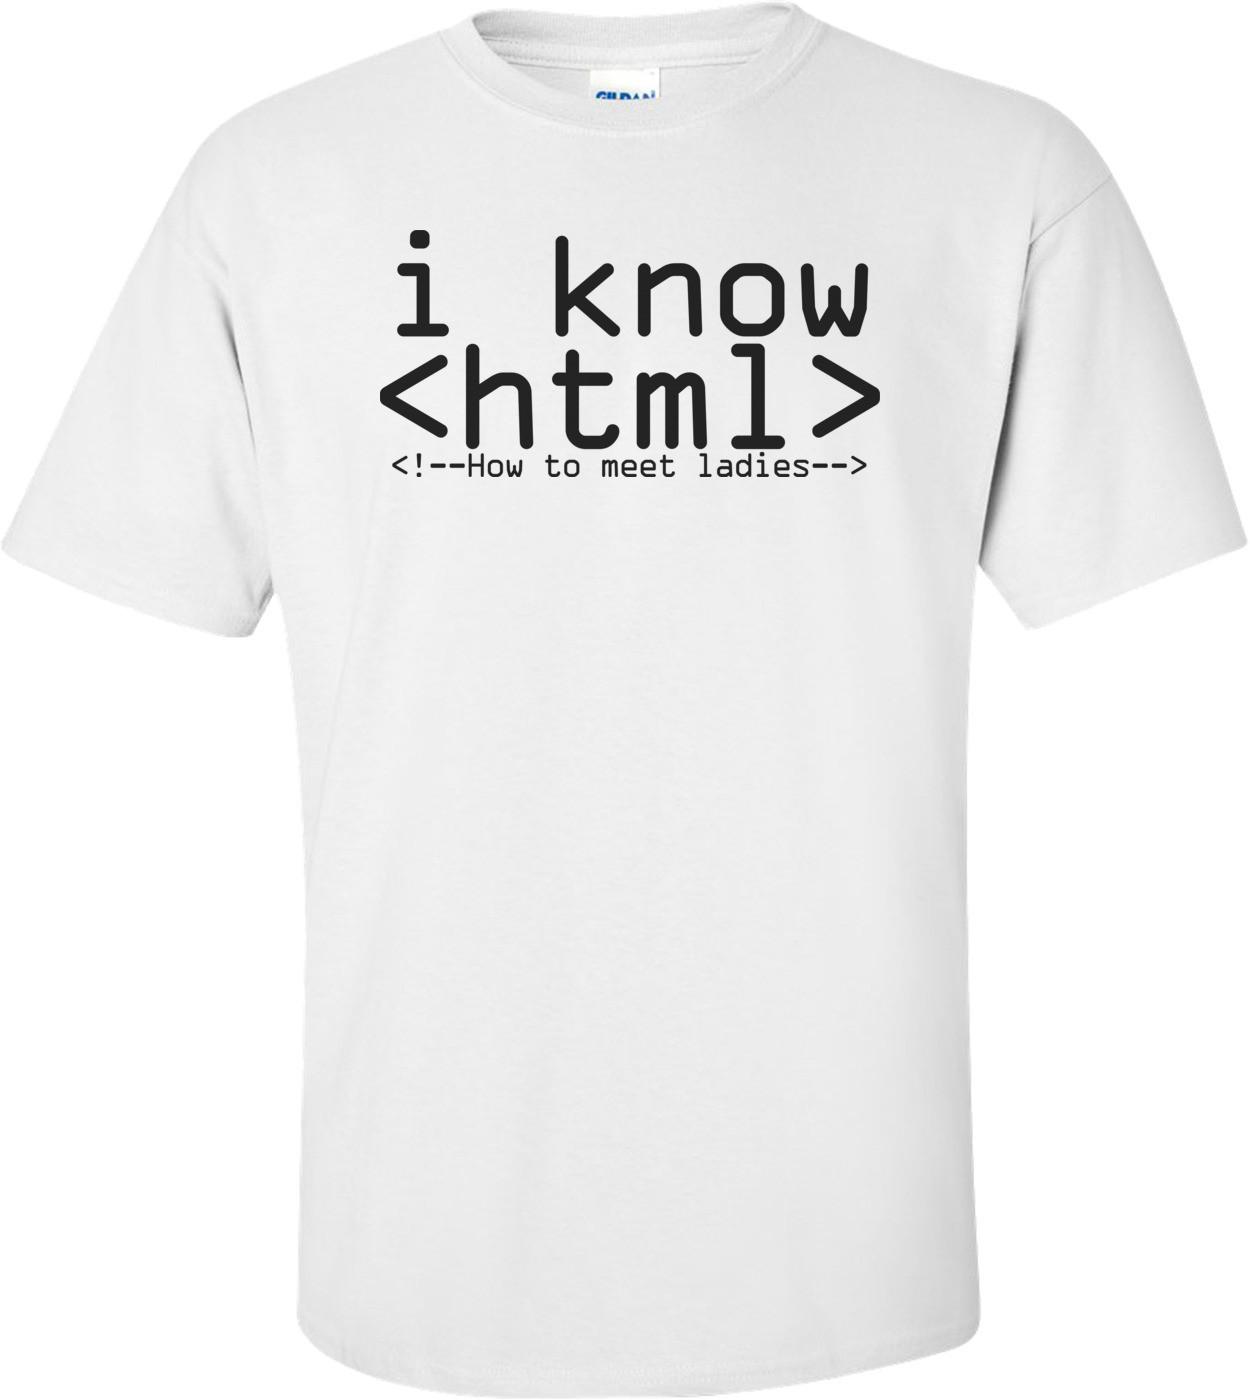 I Know HTML Funny Nerd T-shirt